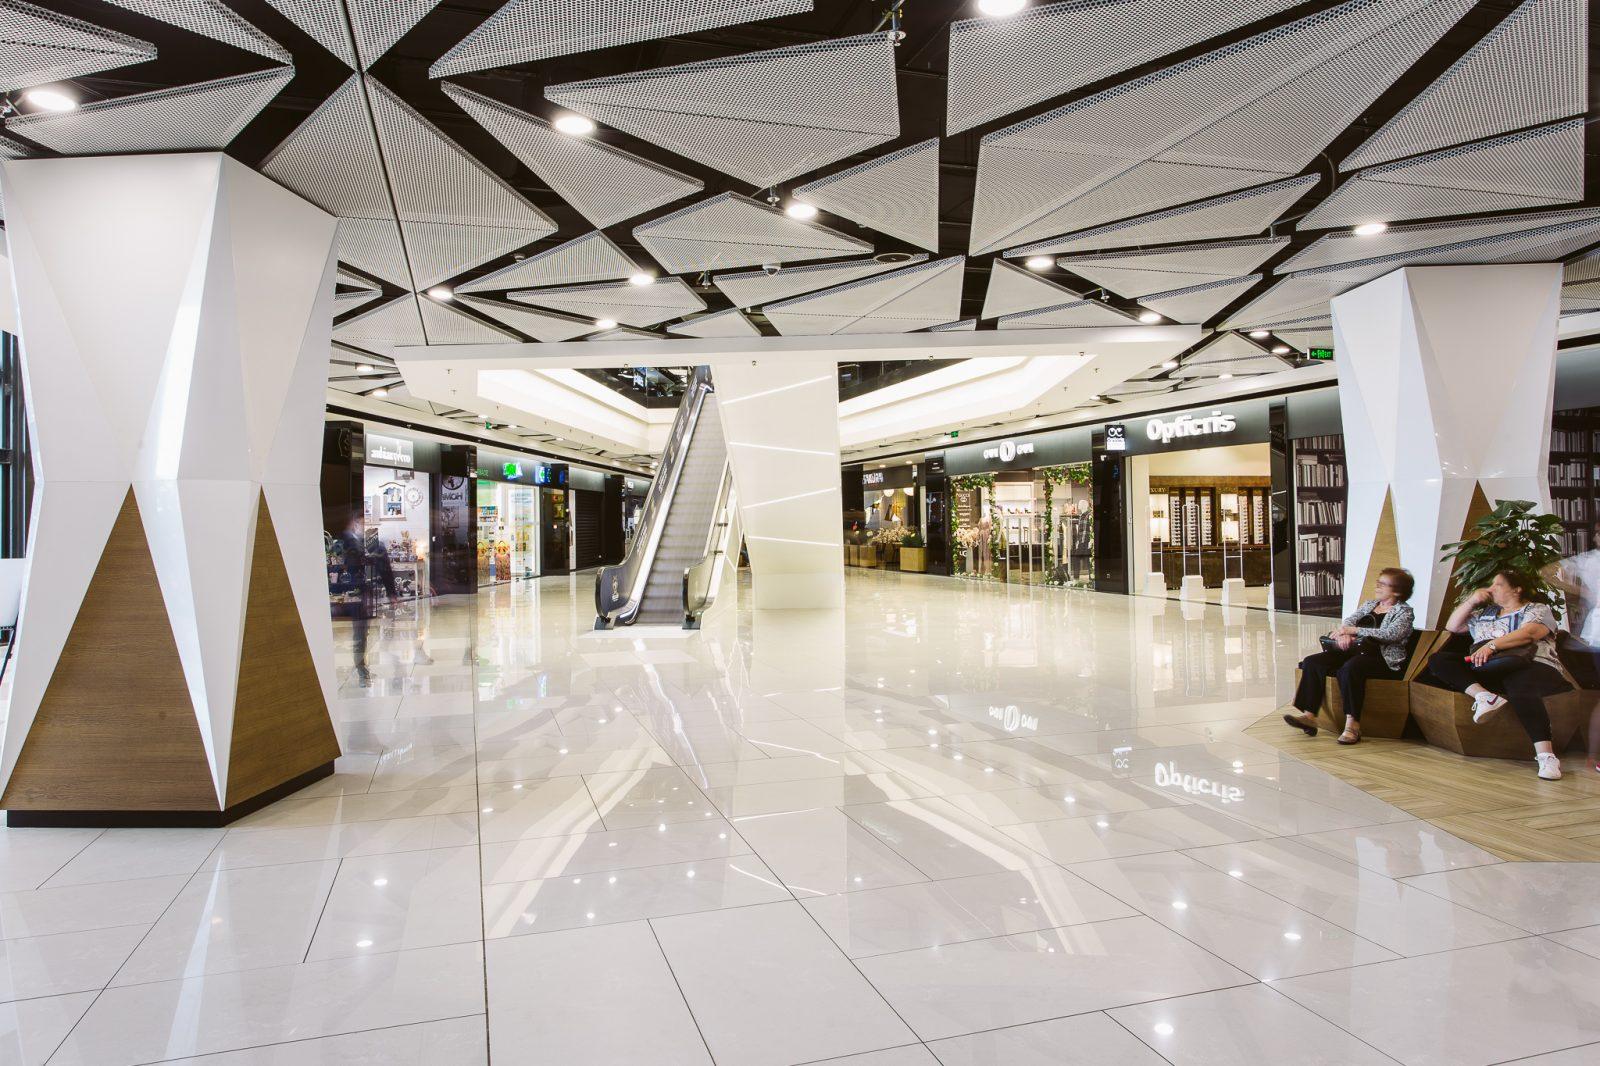 fotograf profesionist fotografie de interior cluj bucuresti mures brasov platinia shopping center hotel arhitectura amenajare design cezar buliga